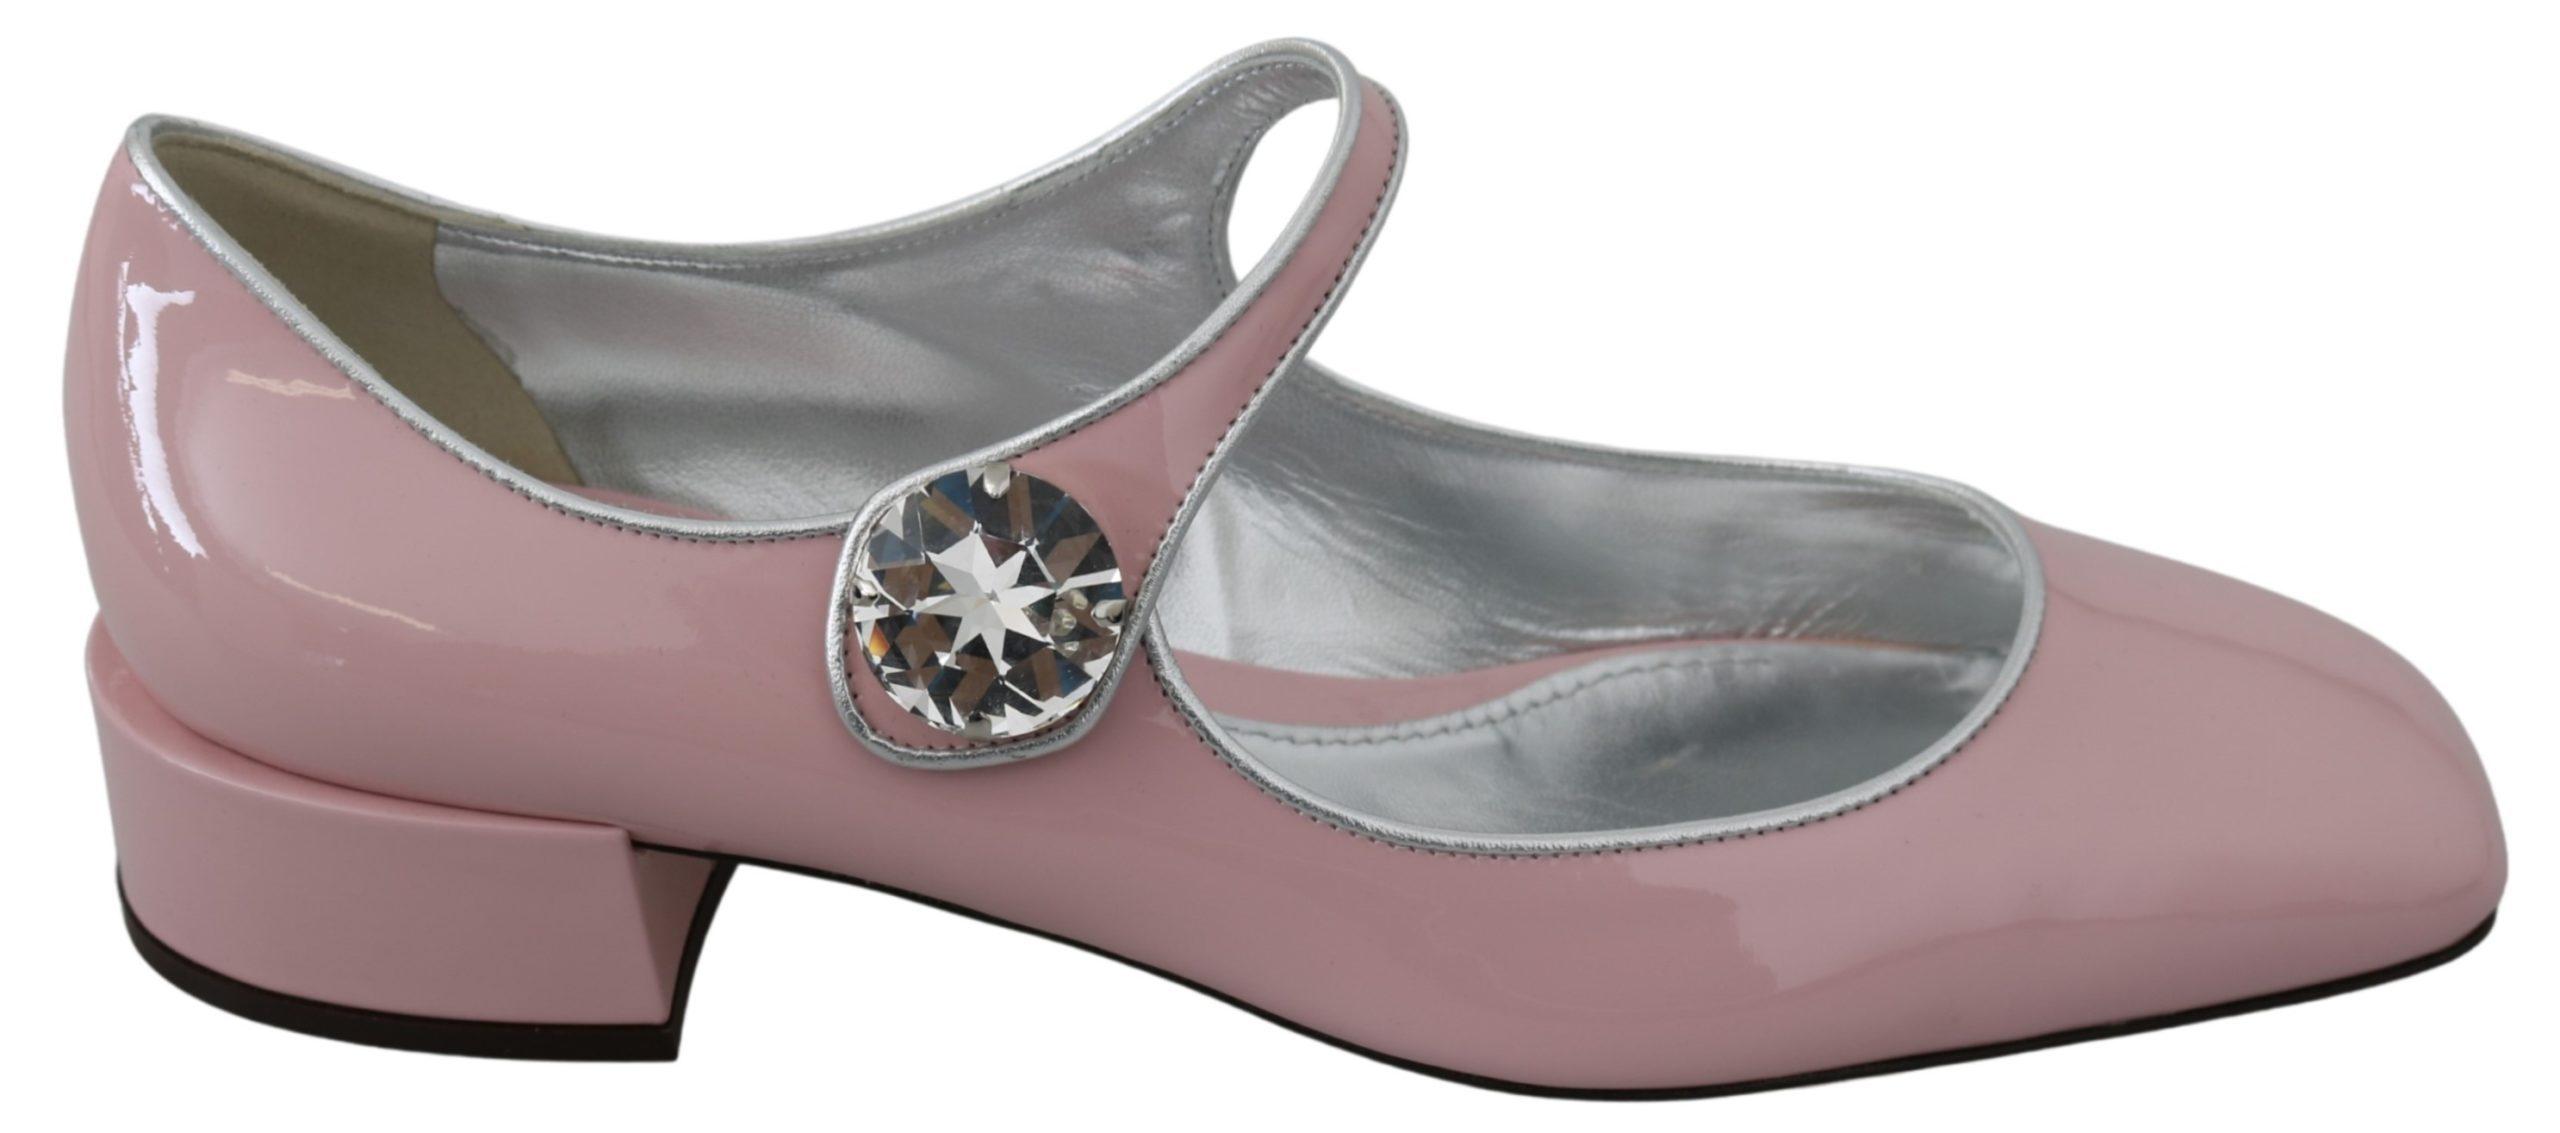 Dolce & Gabbana Women's Leather Crystal Sandal Pink LA7330 - EU39/US8.5